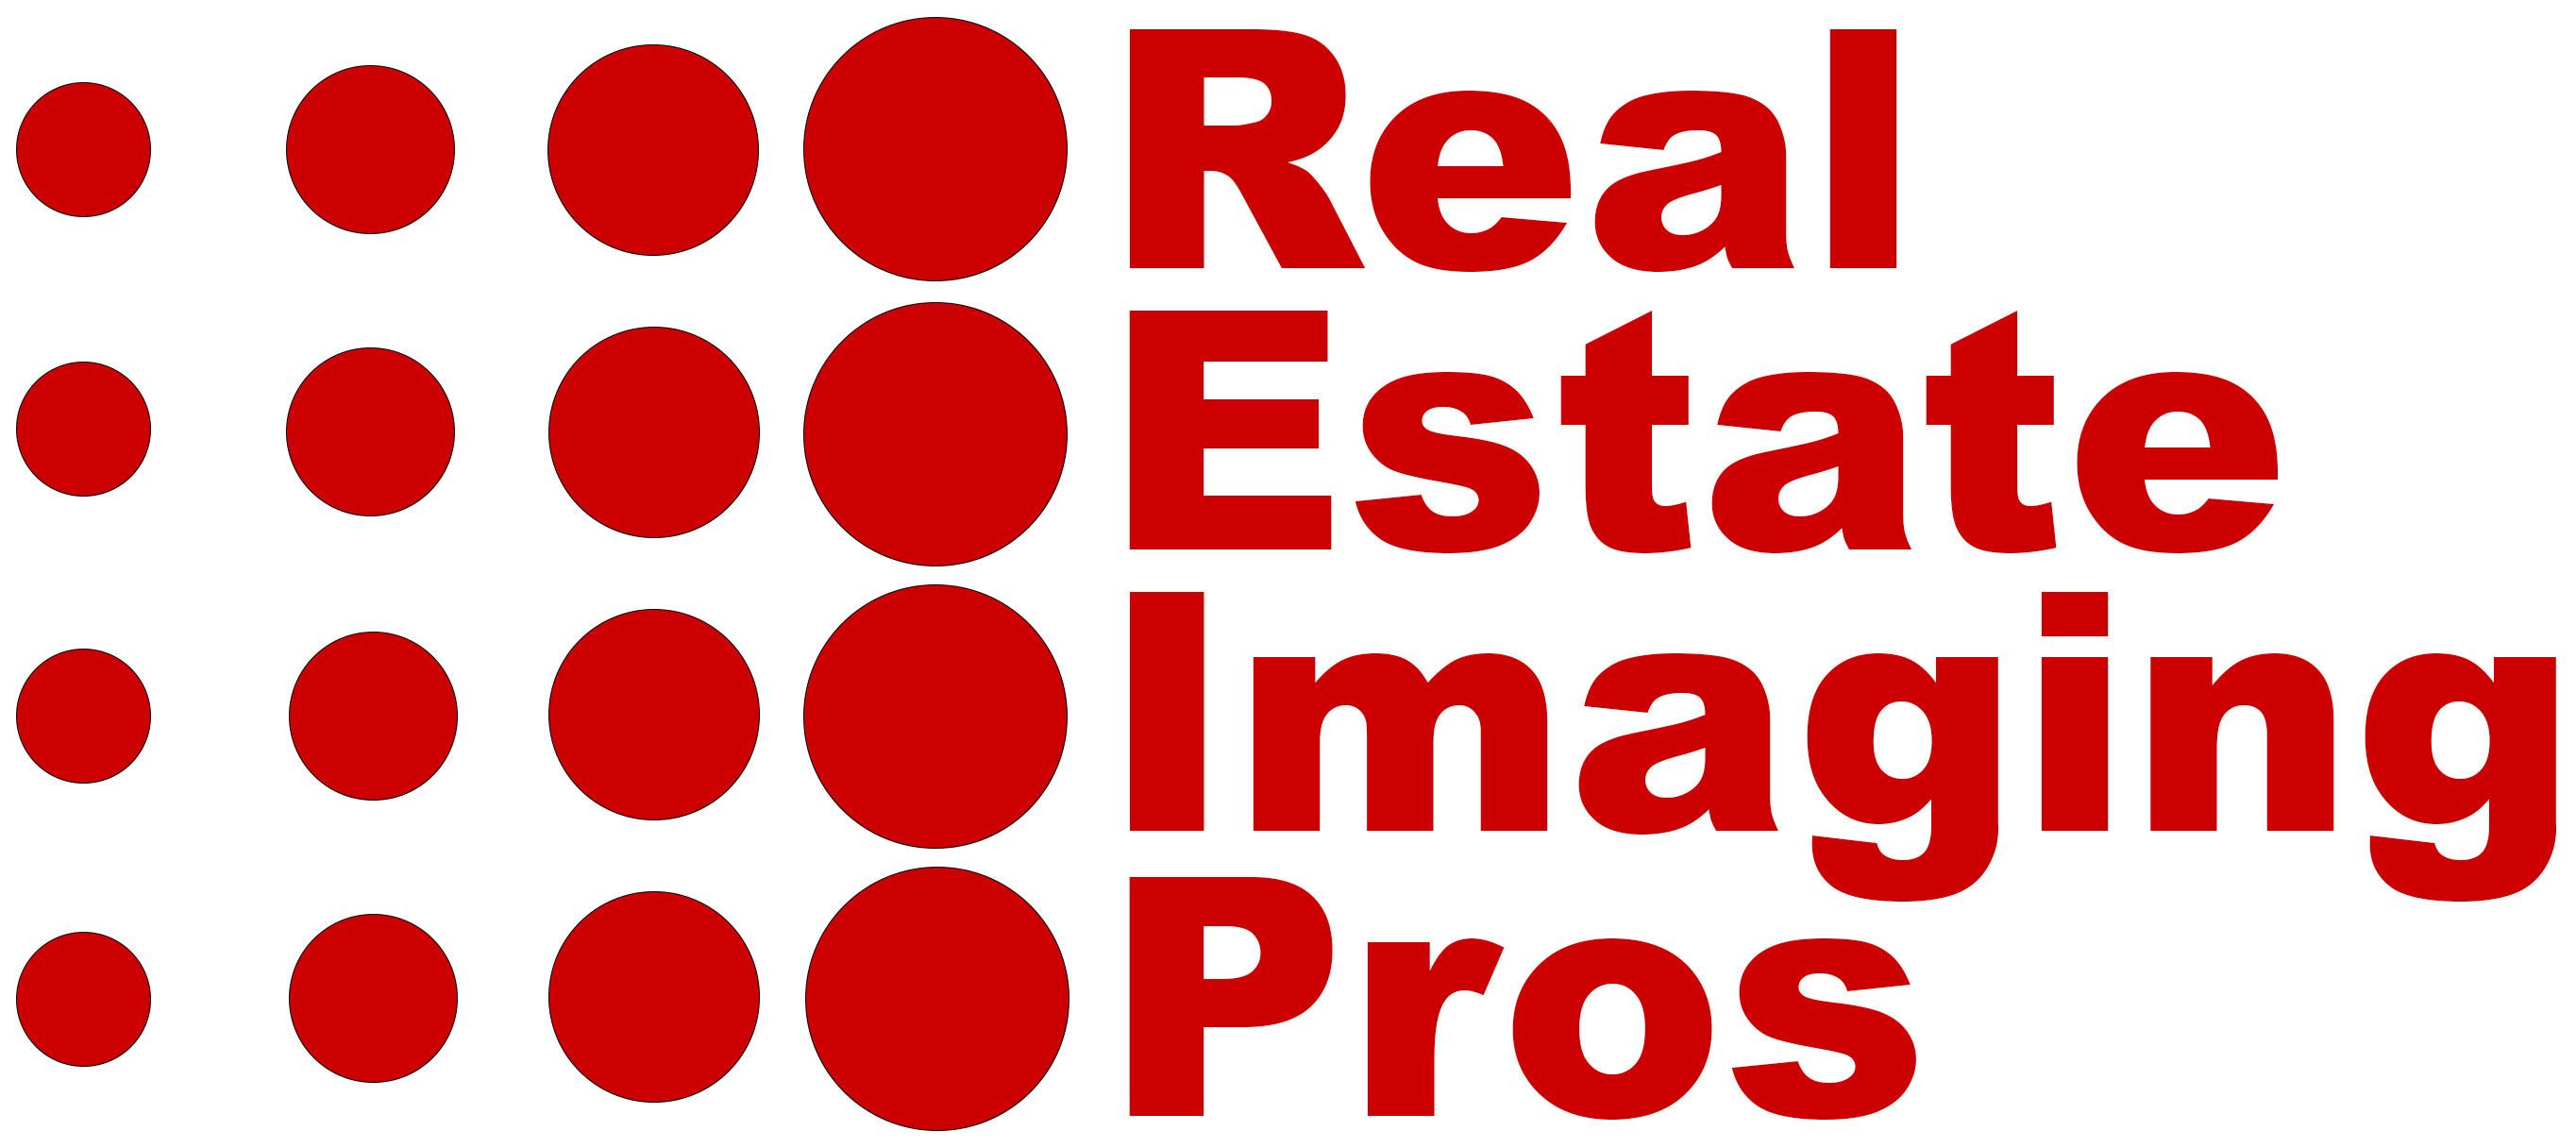 Photos, Matterport, Drones, Video | Orlando | Real Estate